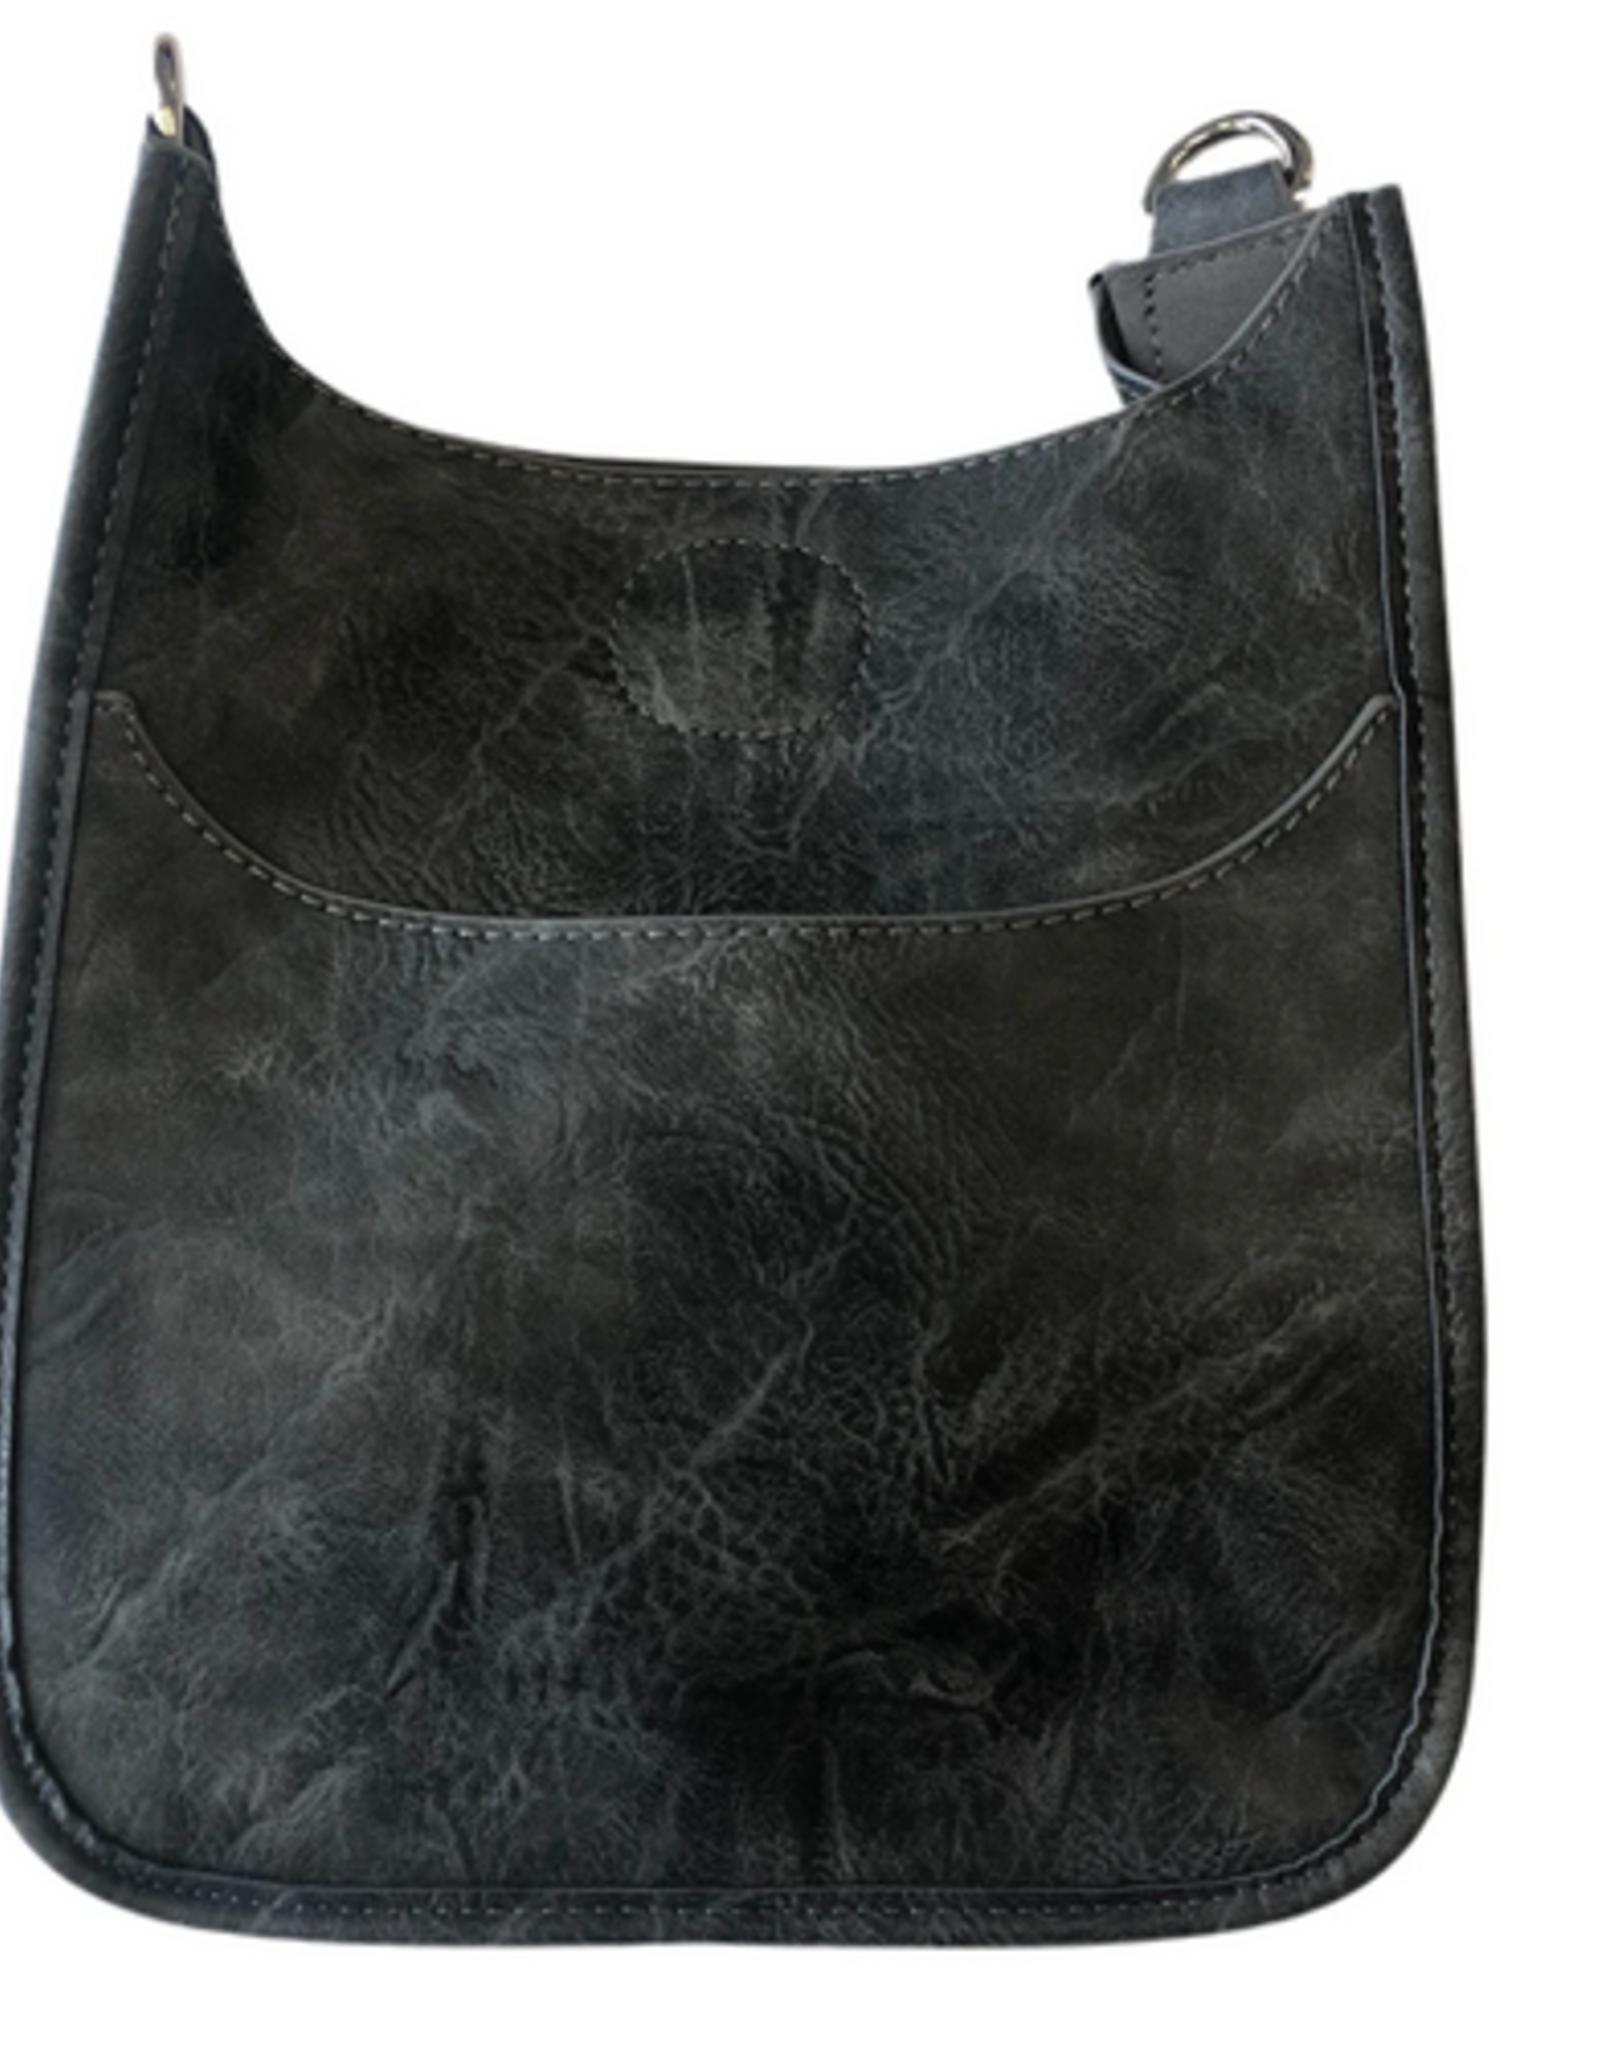 Mini Vegan Messenger Bag w/ silver hardware